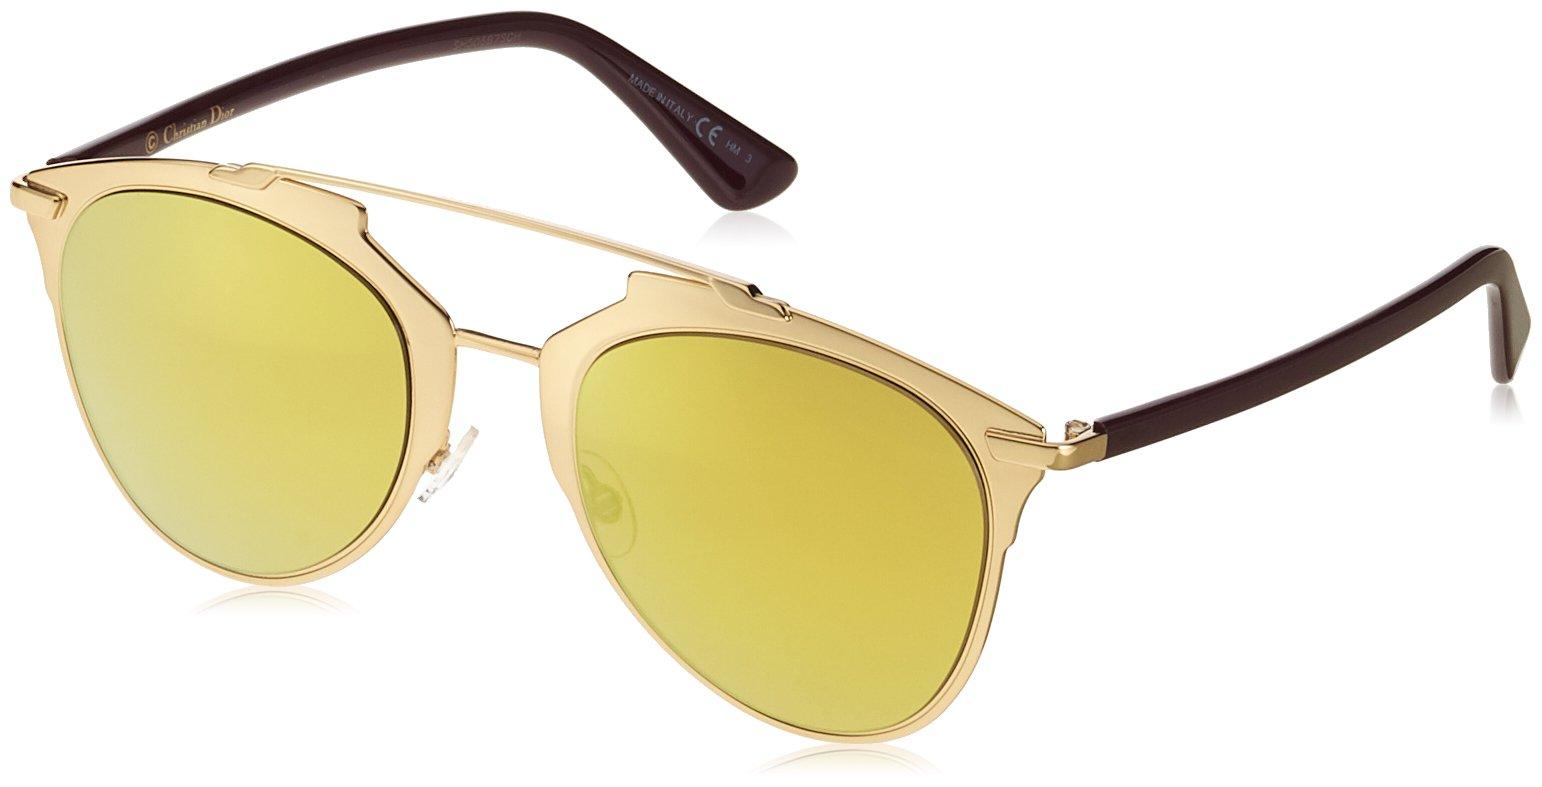 f13c1c22e258 Christian Dior Dior Reflected YC2K1 Gold/Plum Reflected Pilot Sunglasses  Lens